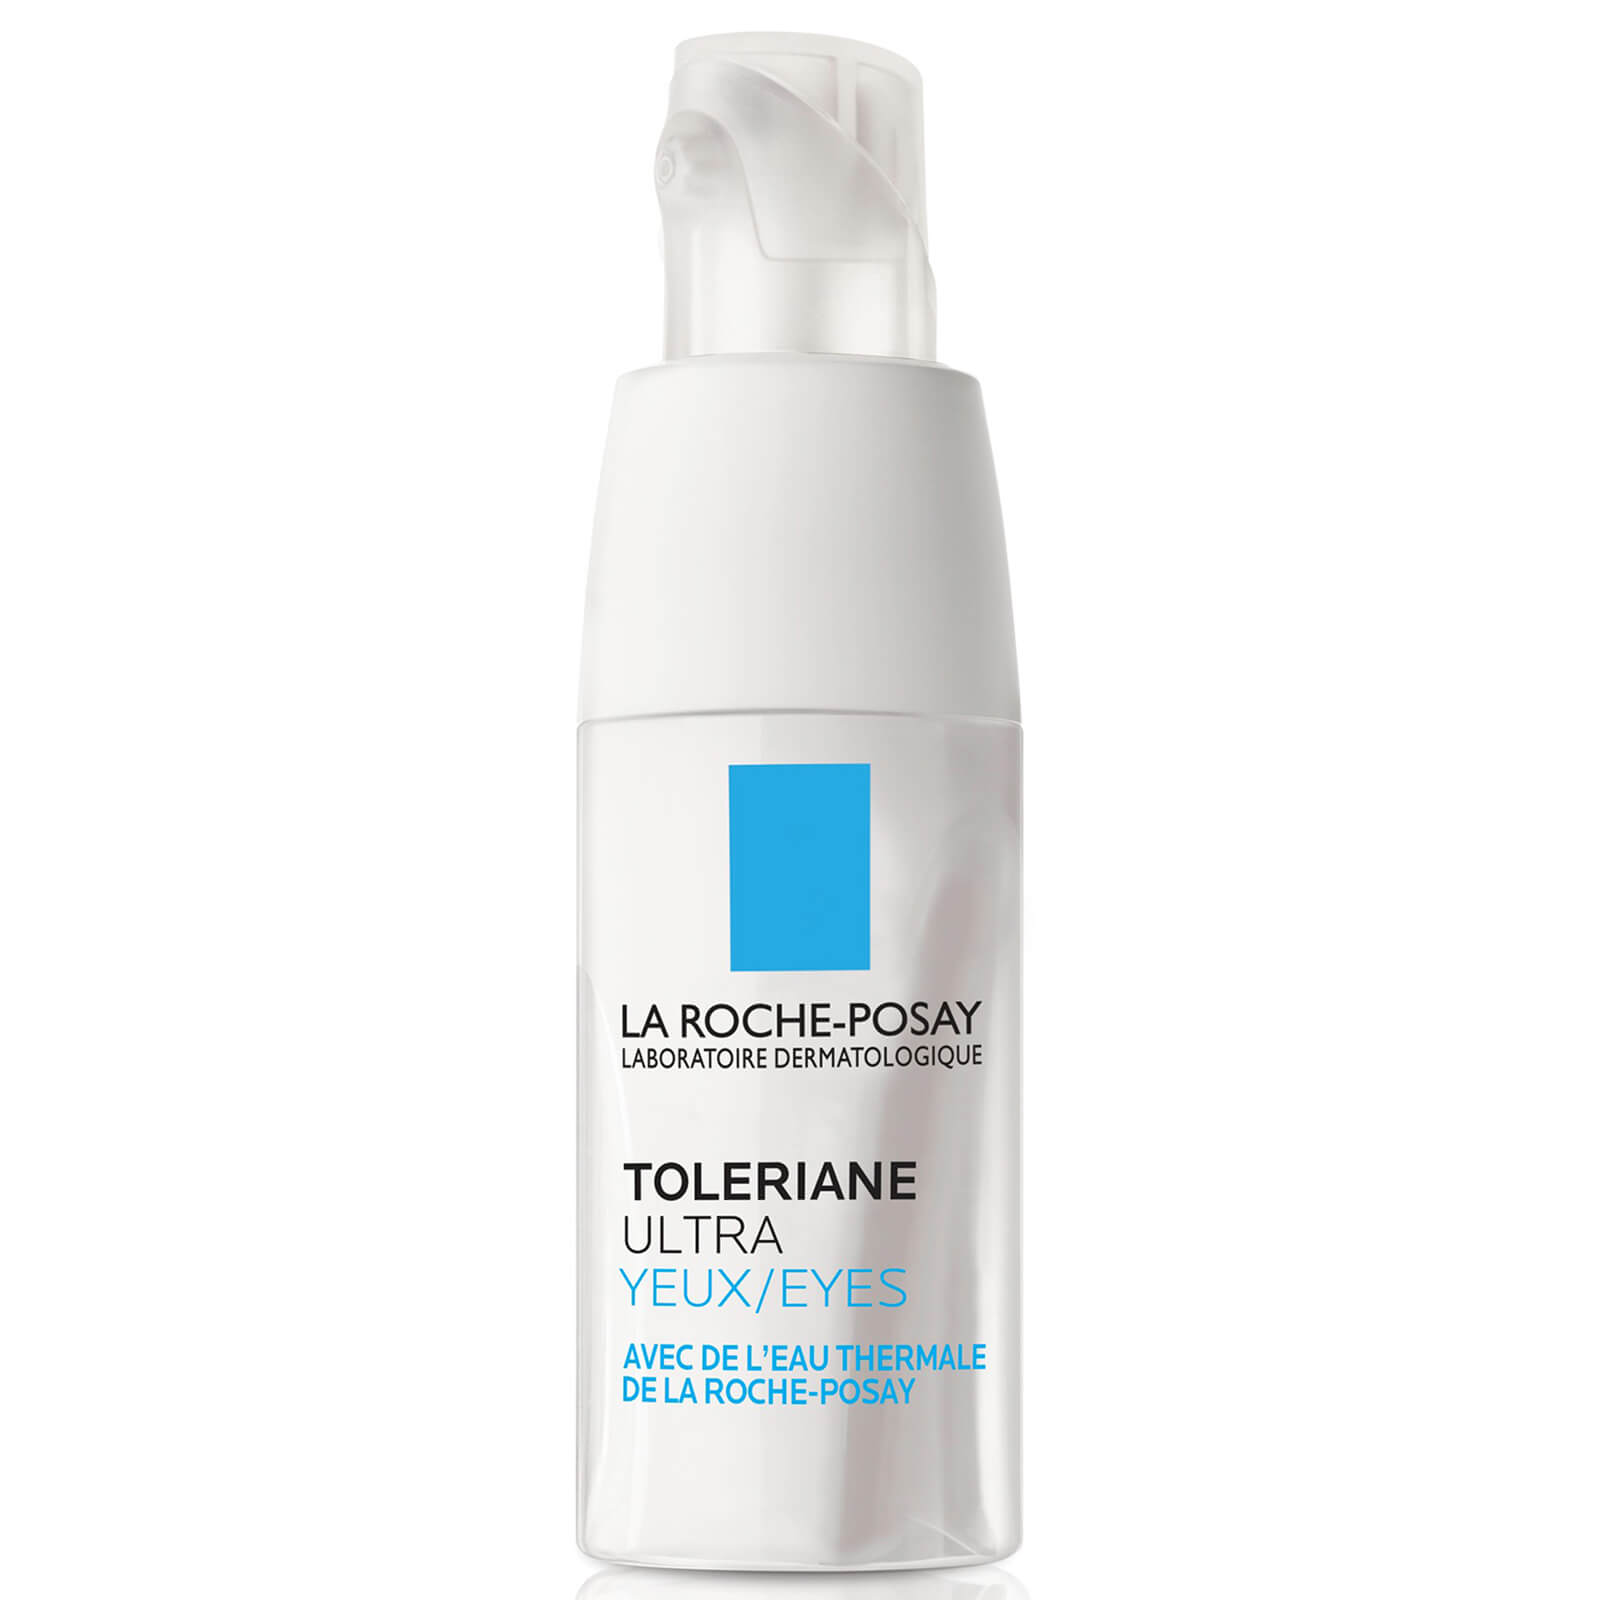 LA ROCHE-POSAY | Toleriane Ultra Soothing Eye Cream